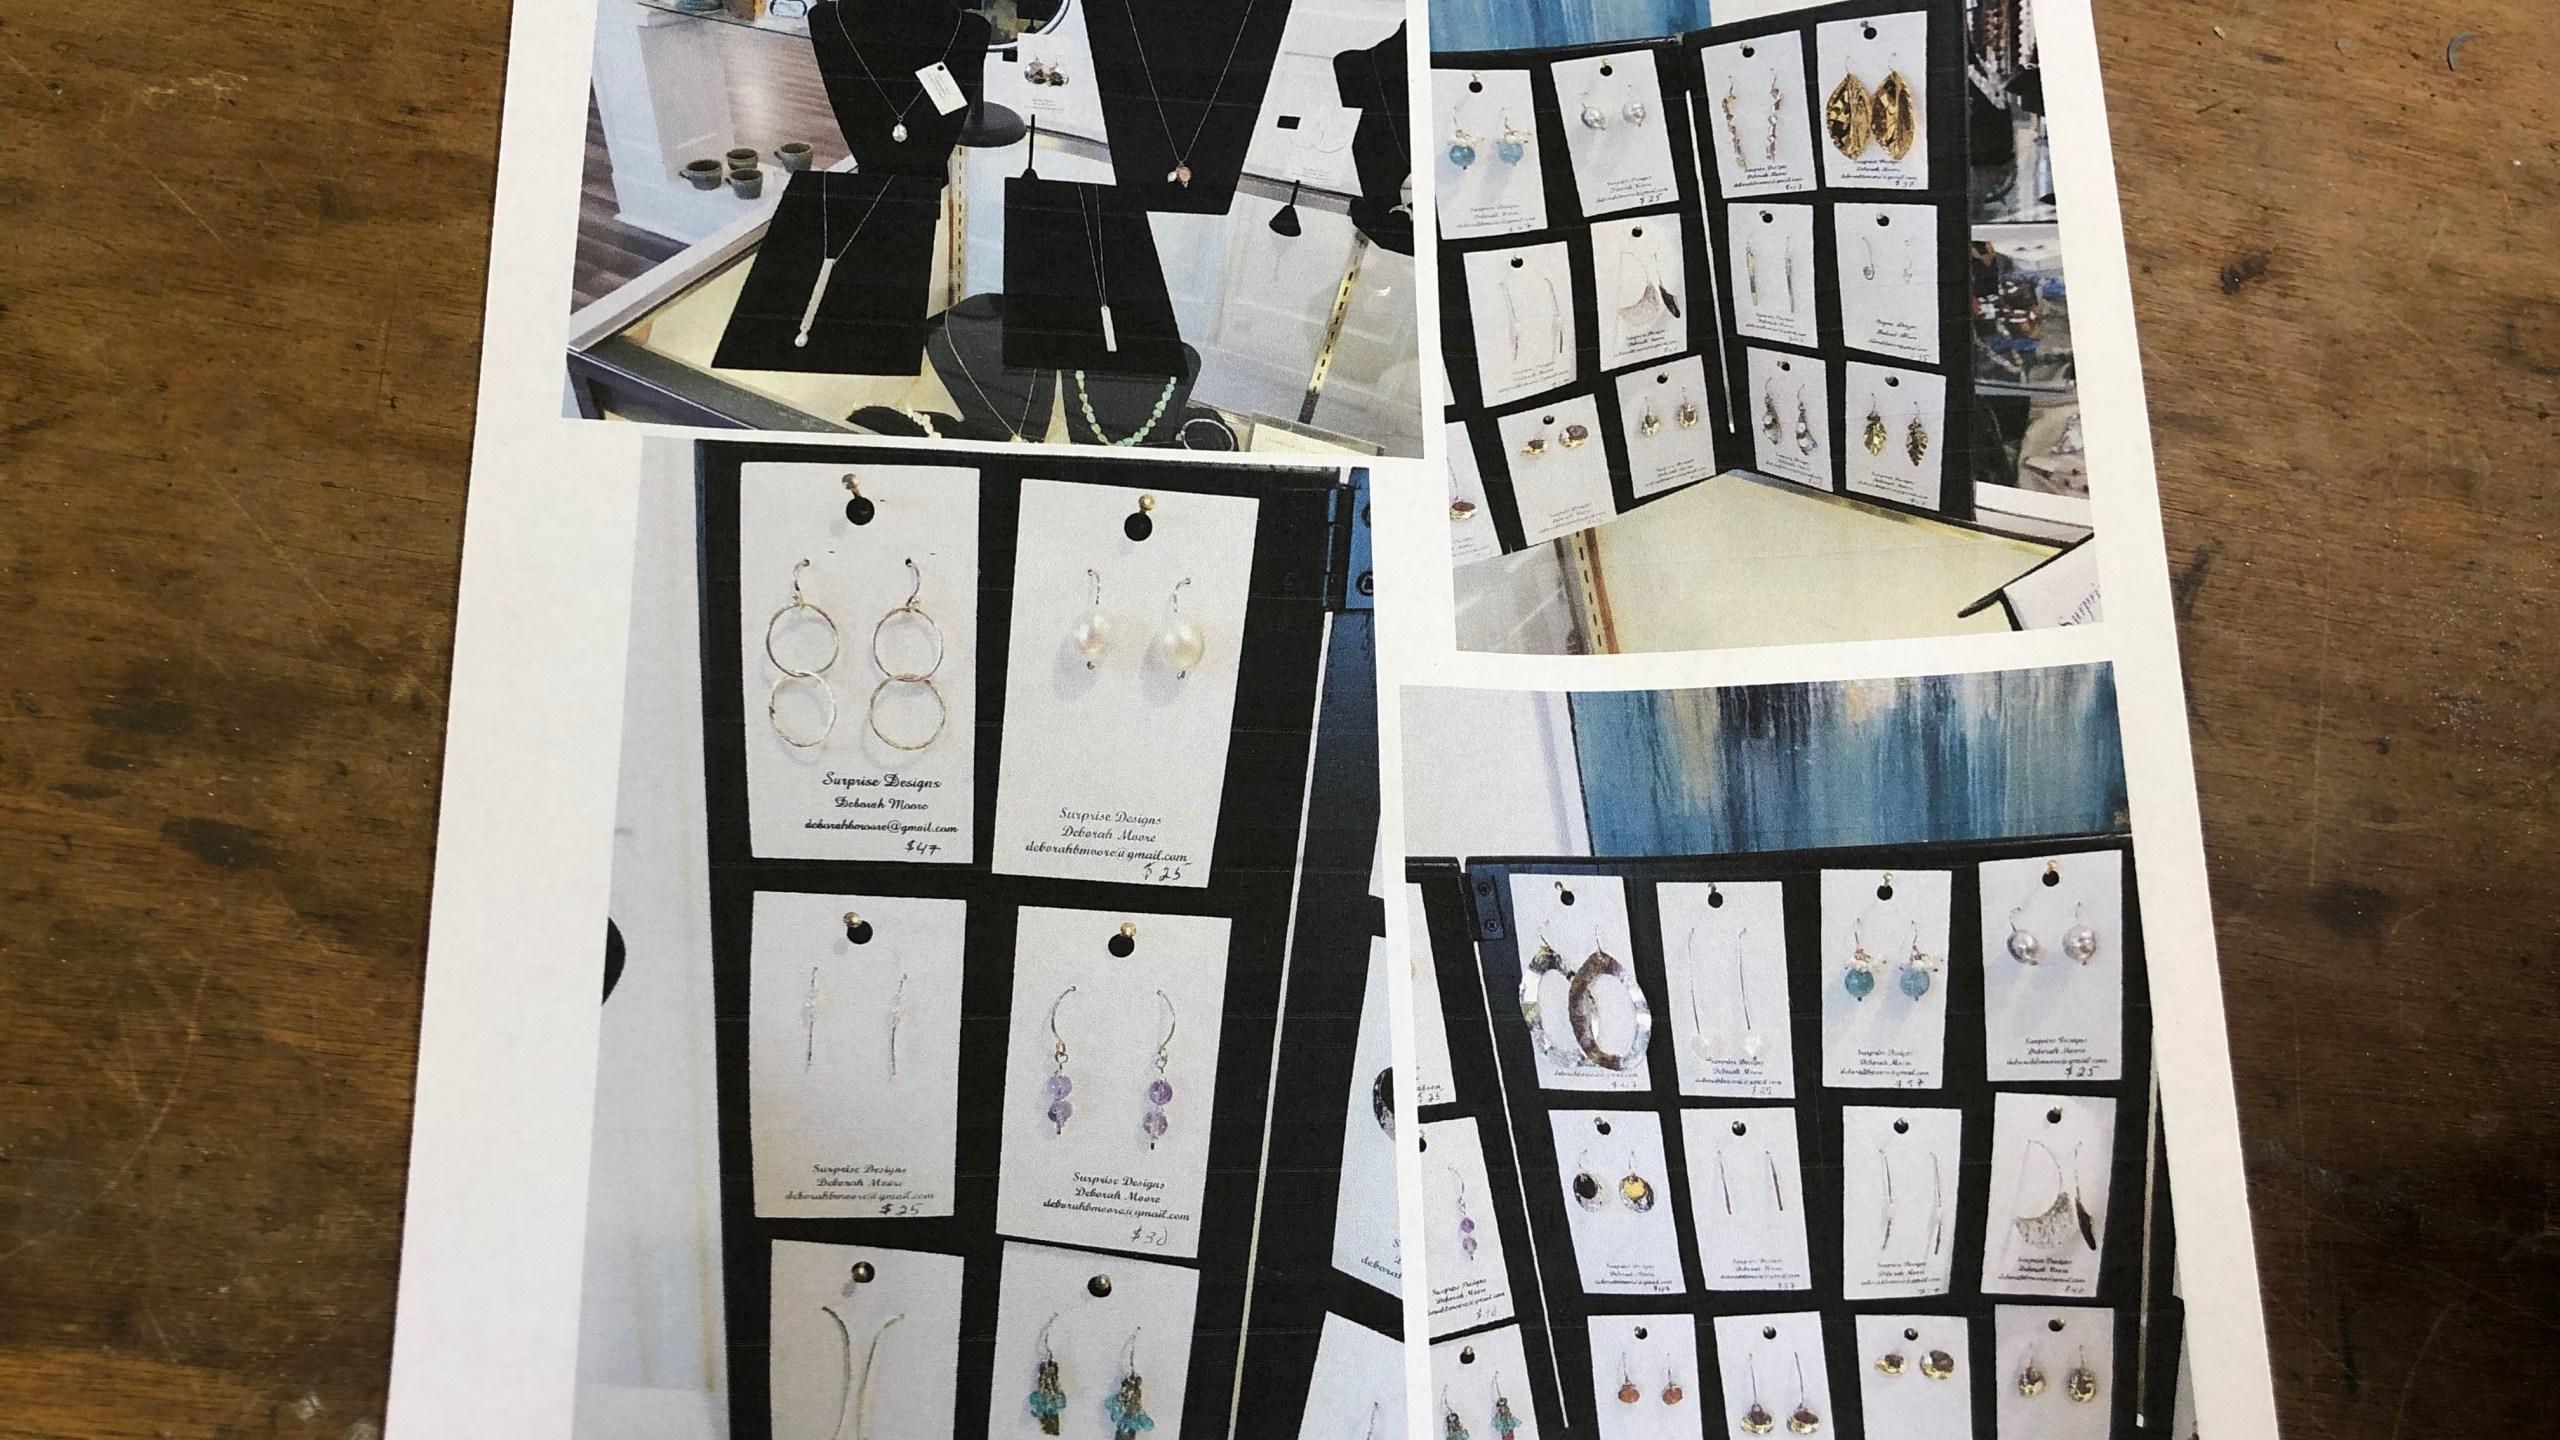 Jewelry stolen from Innova Arts